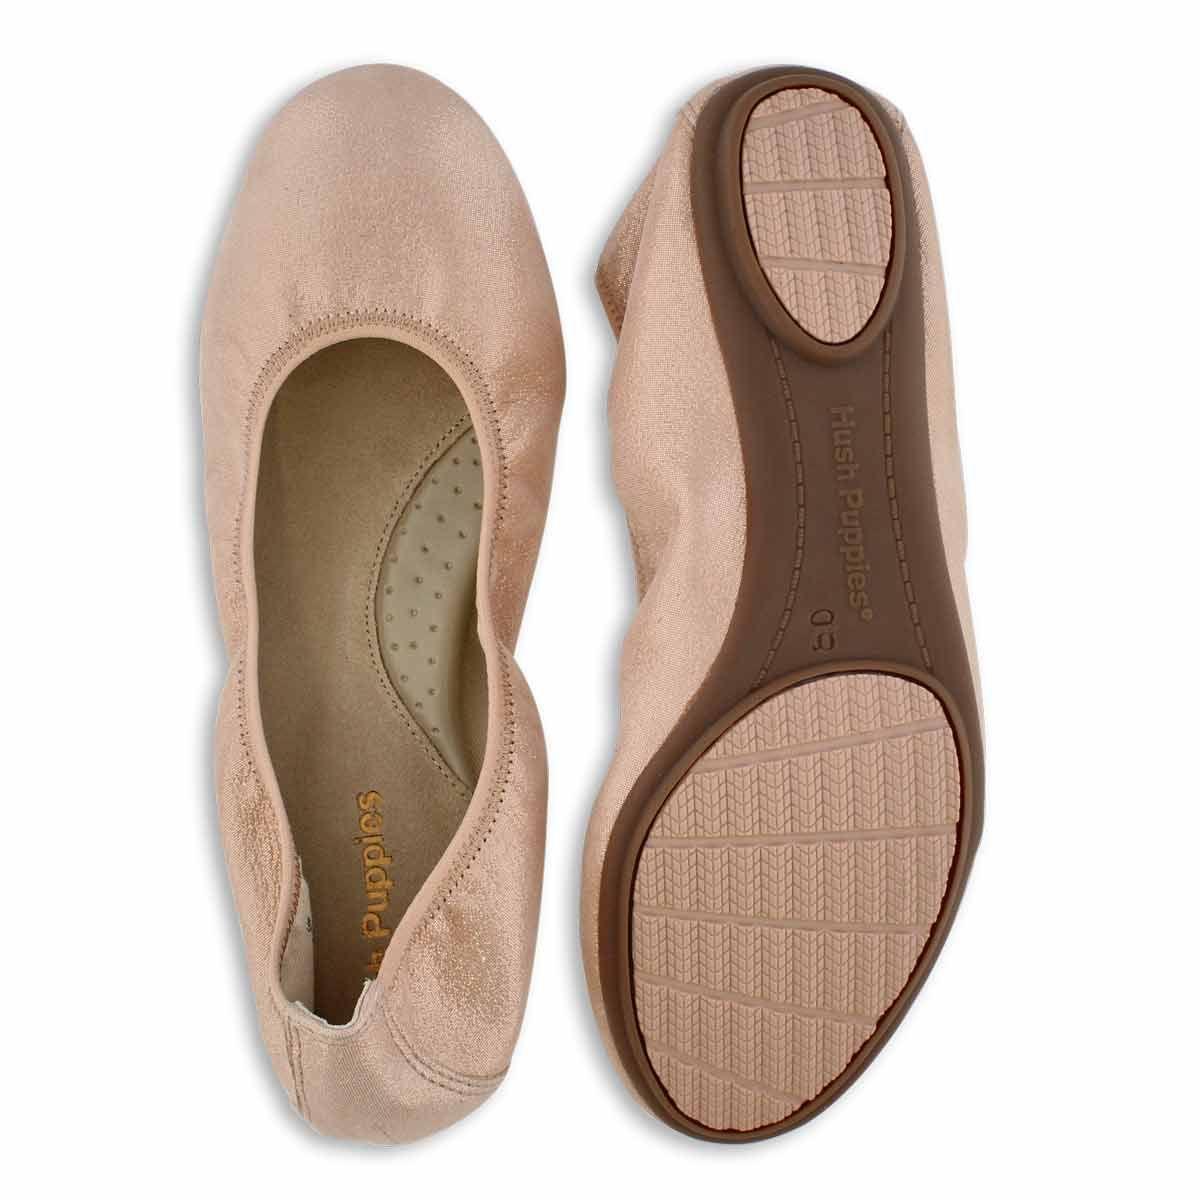 Hush Puppies Women S Chaste Ballet Pale Peach Softmoc Com Casual Shoes Women Hush Puppies Women Hush Puppies